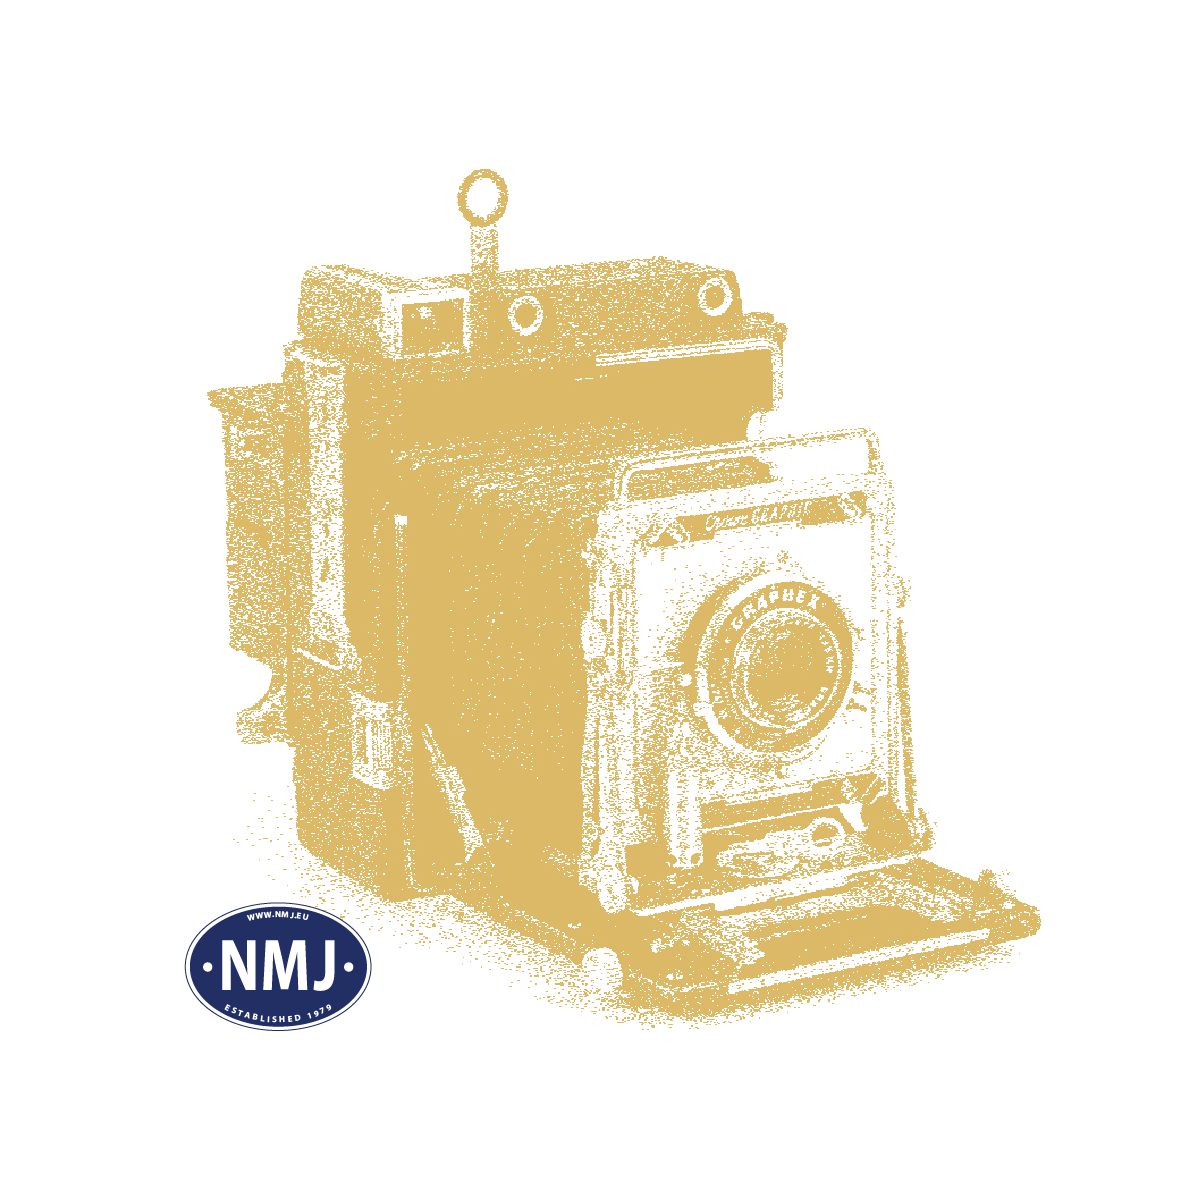 NMJT90101 - NMJ Topline DSB MY 1108, DCC m/ sound